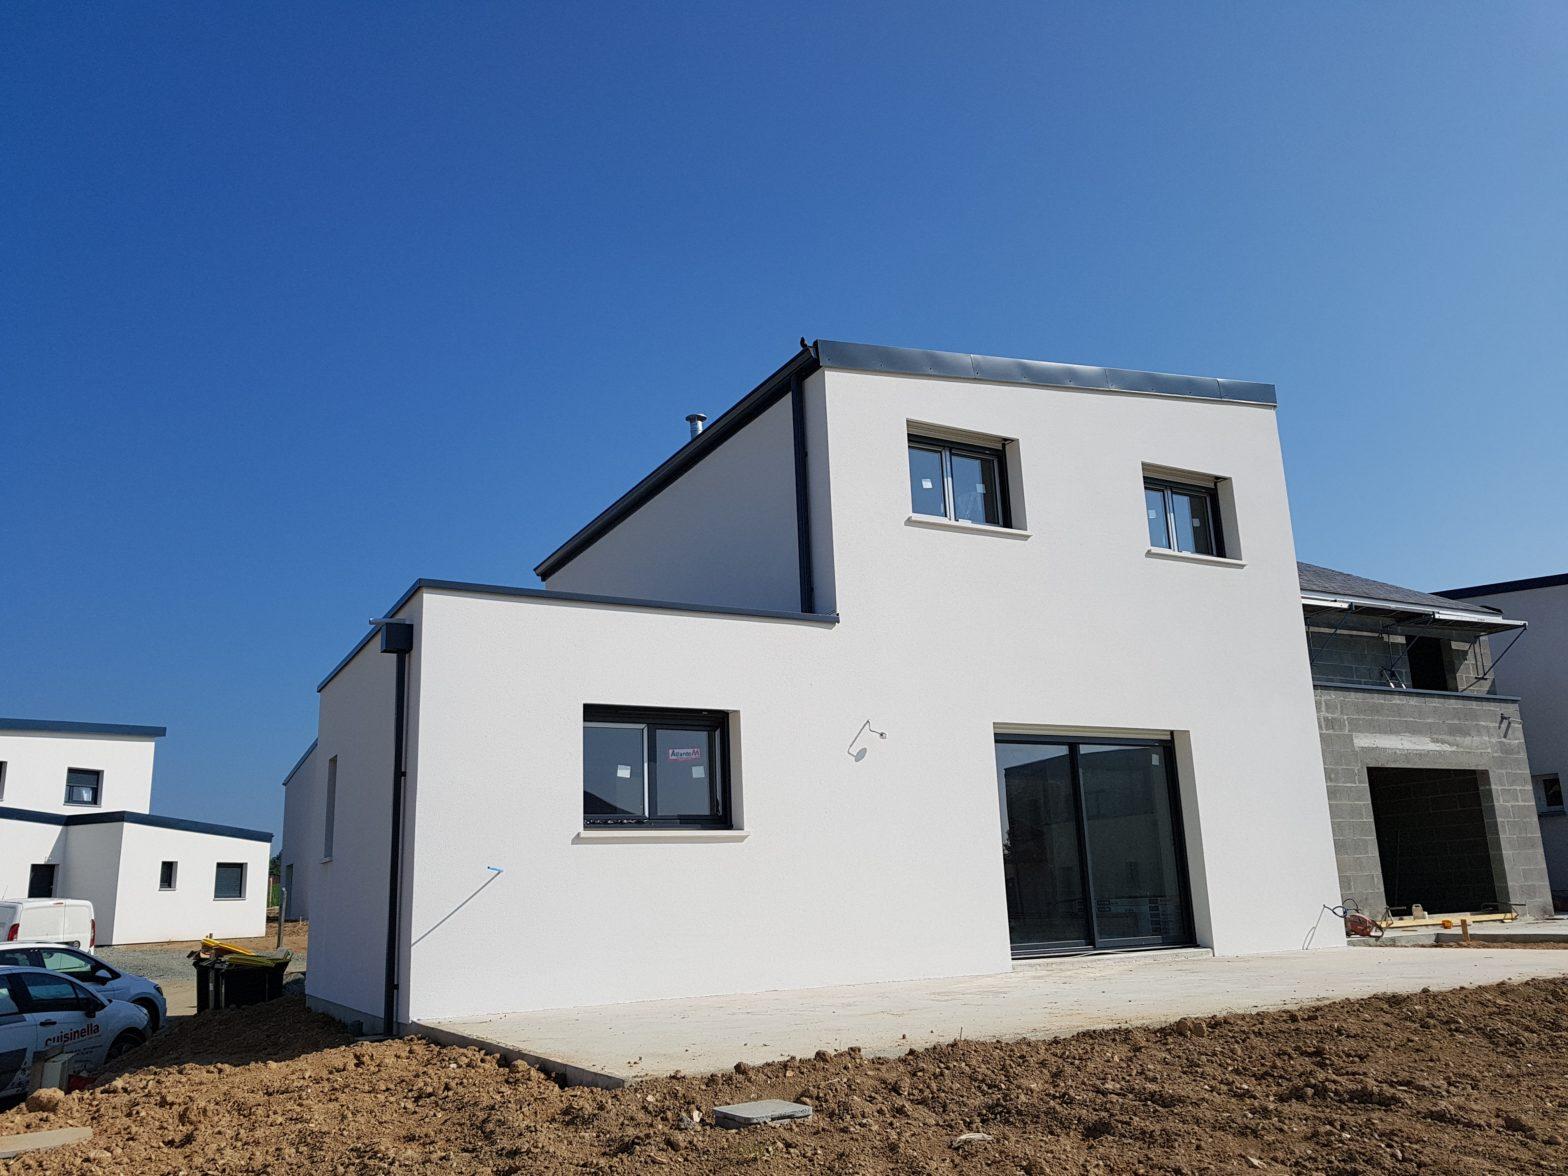 maison etage r+1 toit monopente 49070 beaucouze